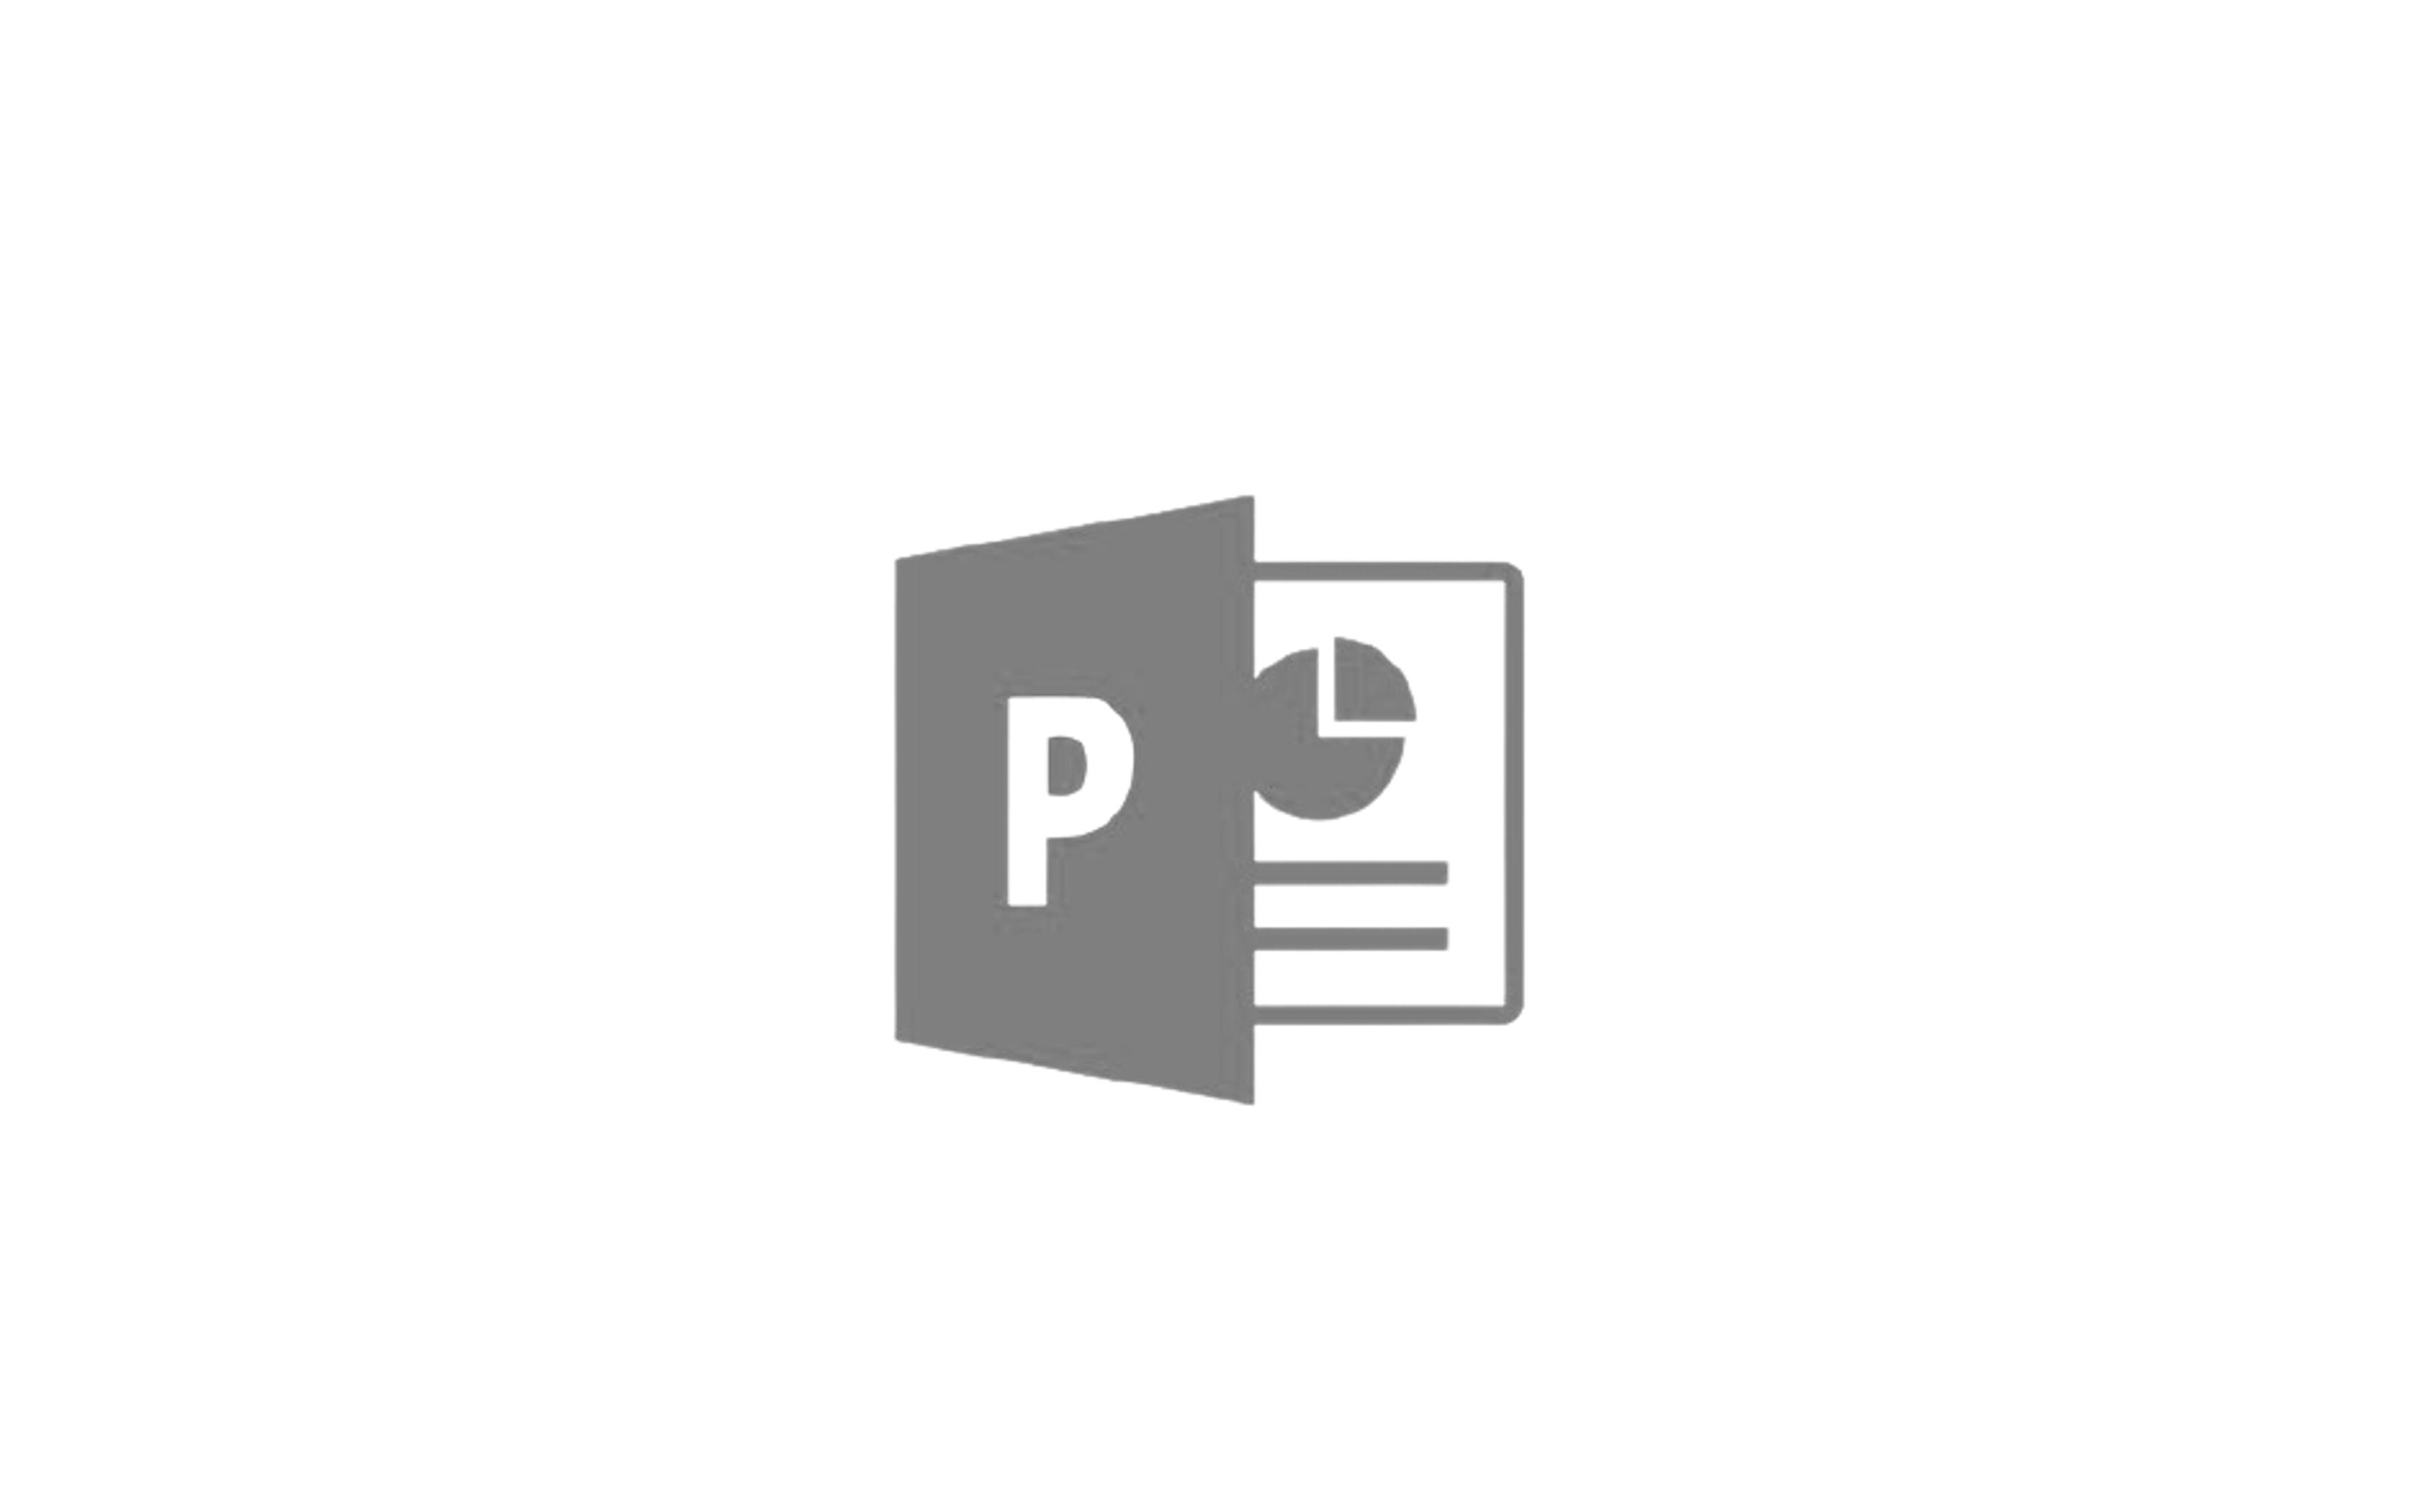 Powerpoint 로고